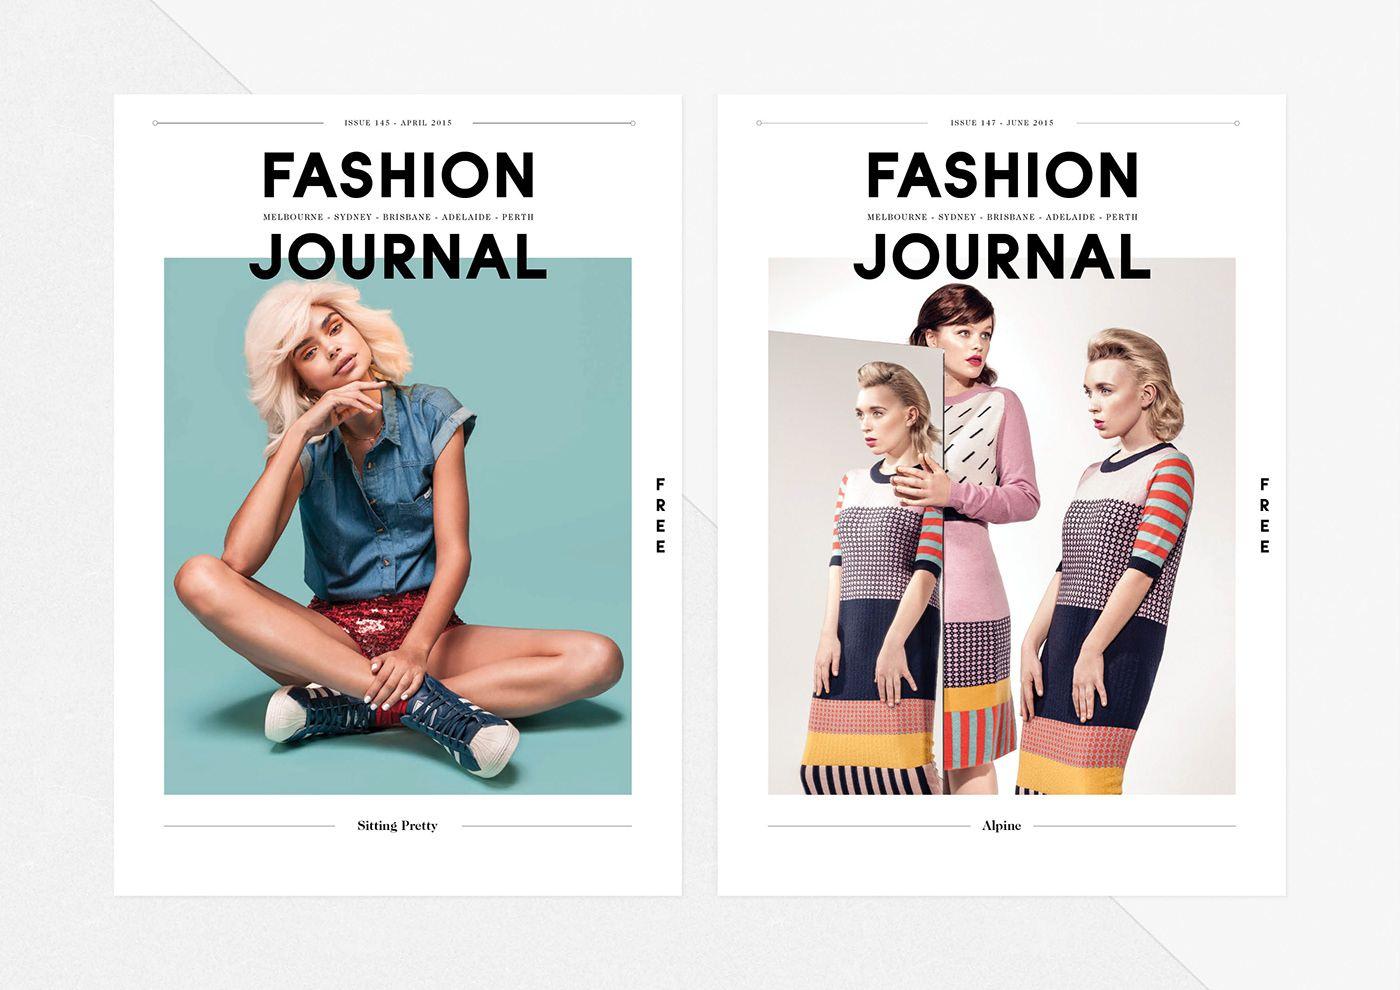 Fashion Journal Magazine On Behance Fashion Journals Fashion Magazine